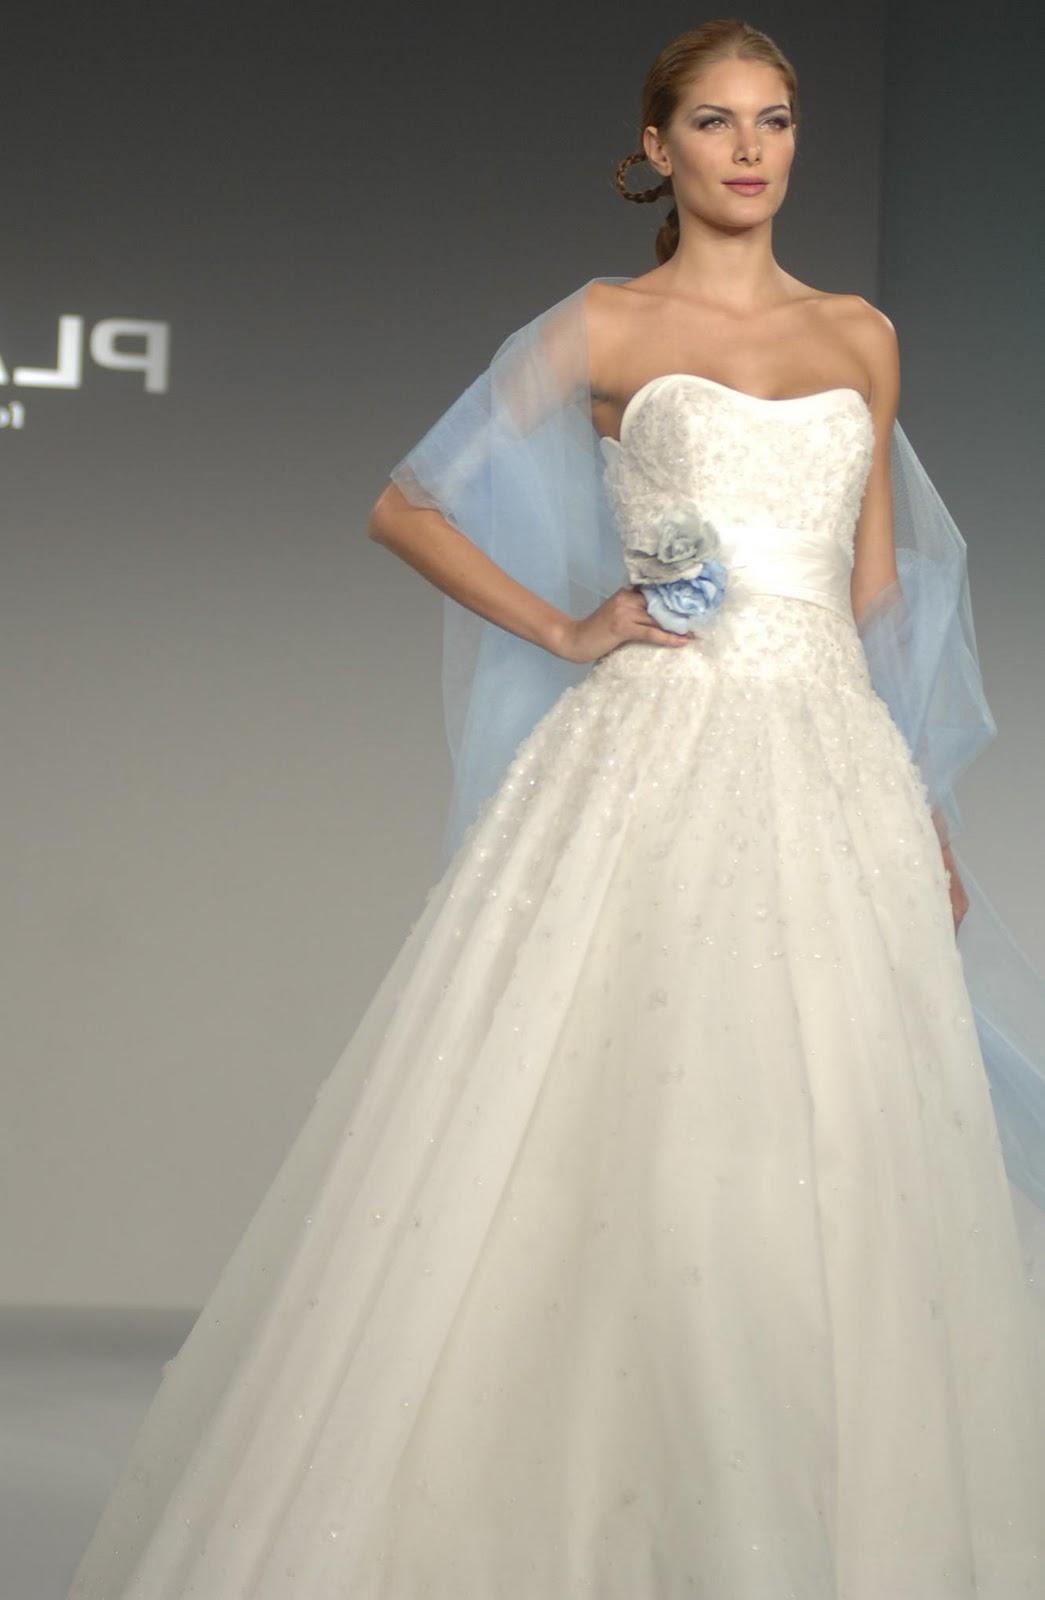 Tags: blue wedding dresses,